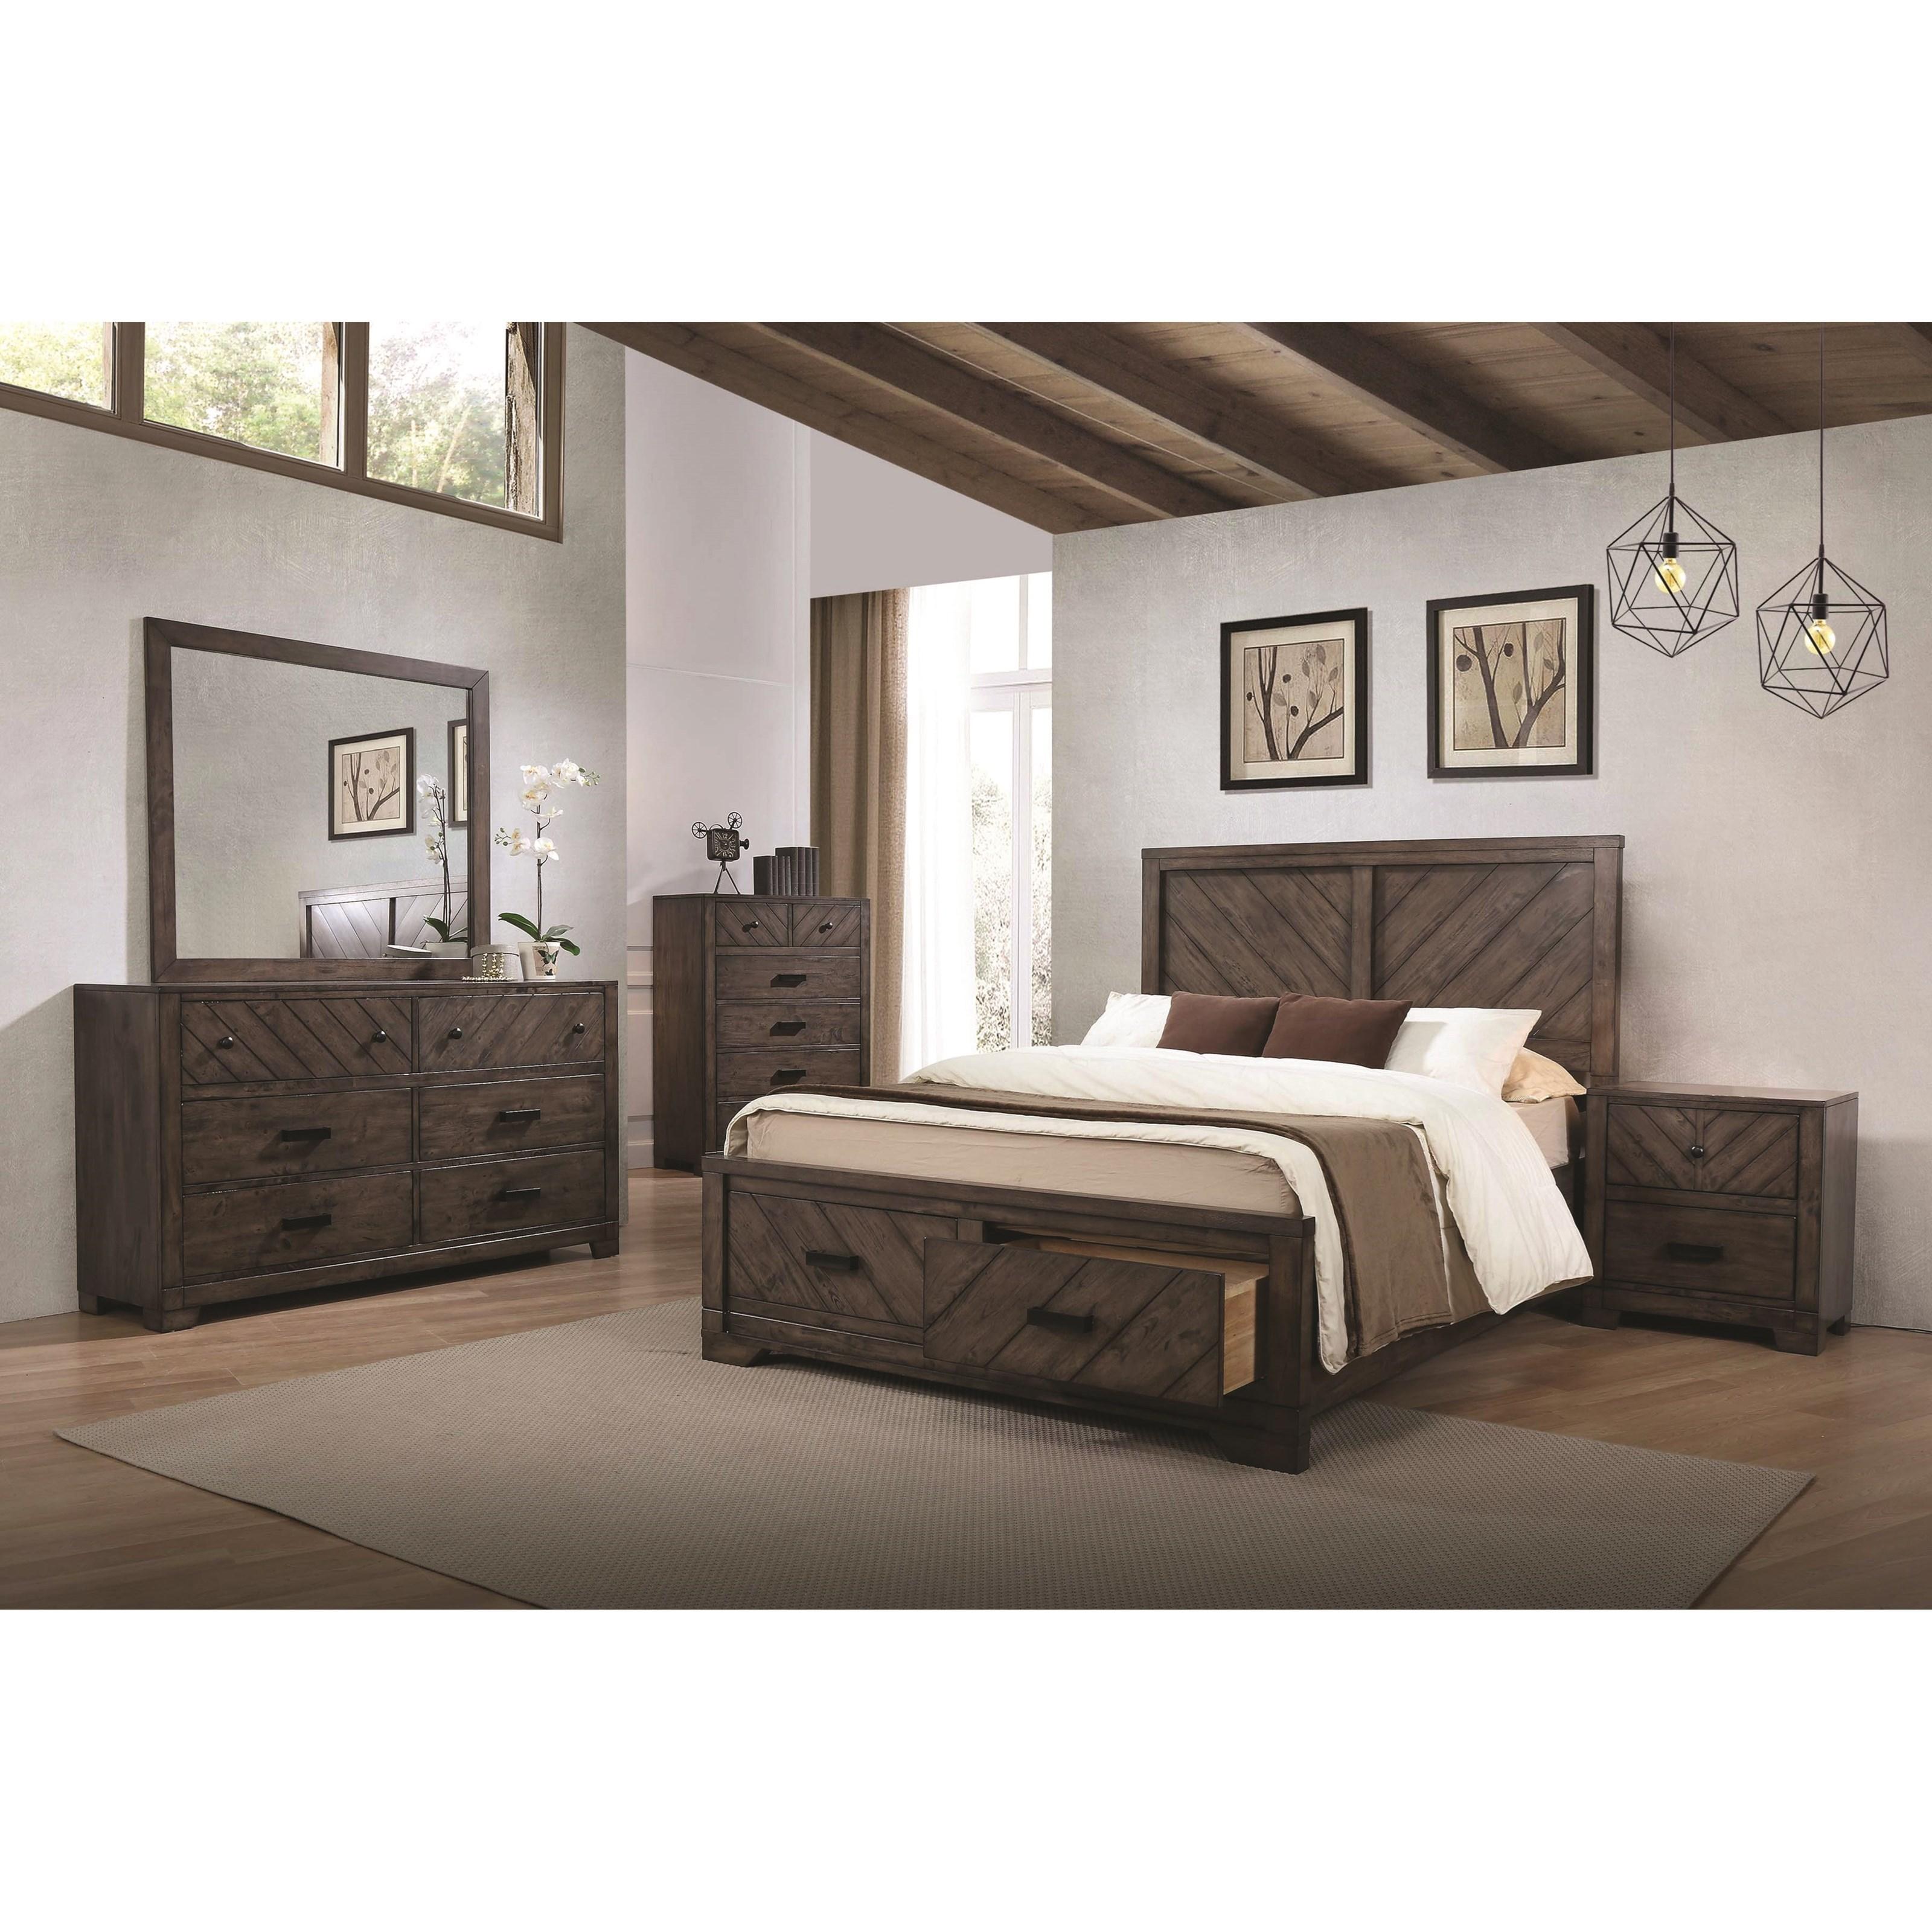 Coaster lawndale king bedroom group rife 39 s home for Bedroom groups